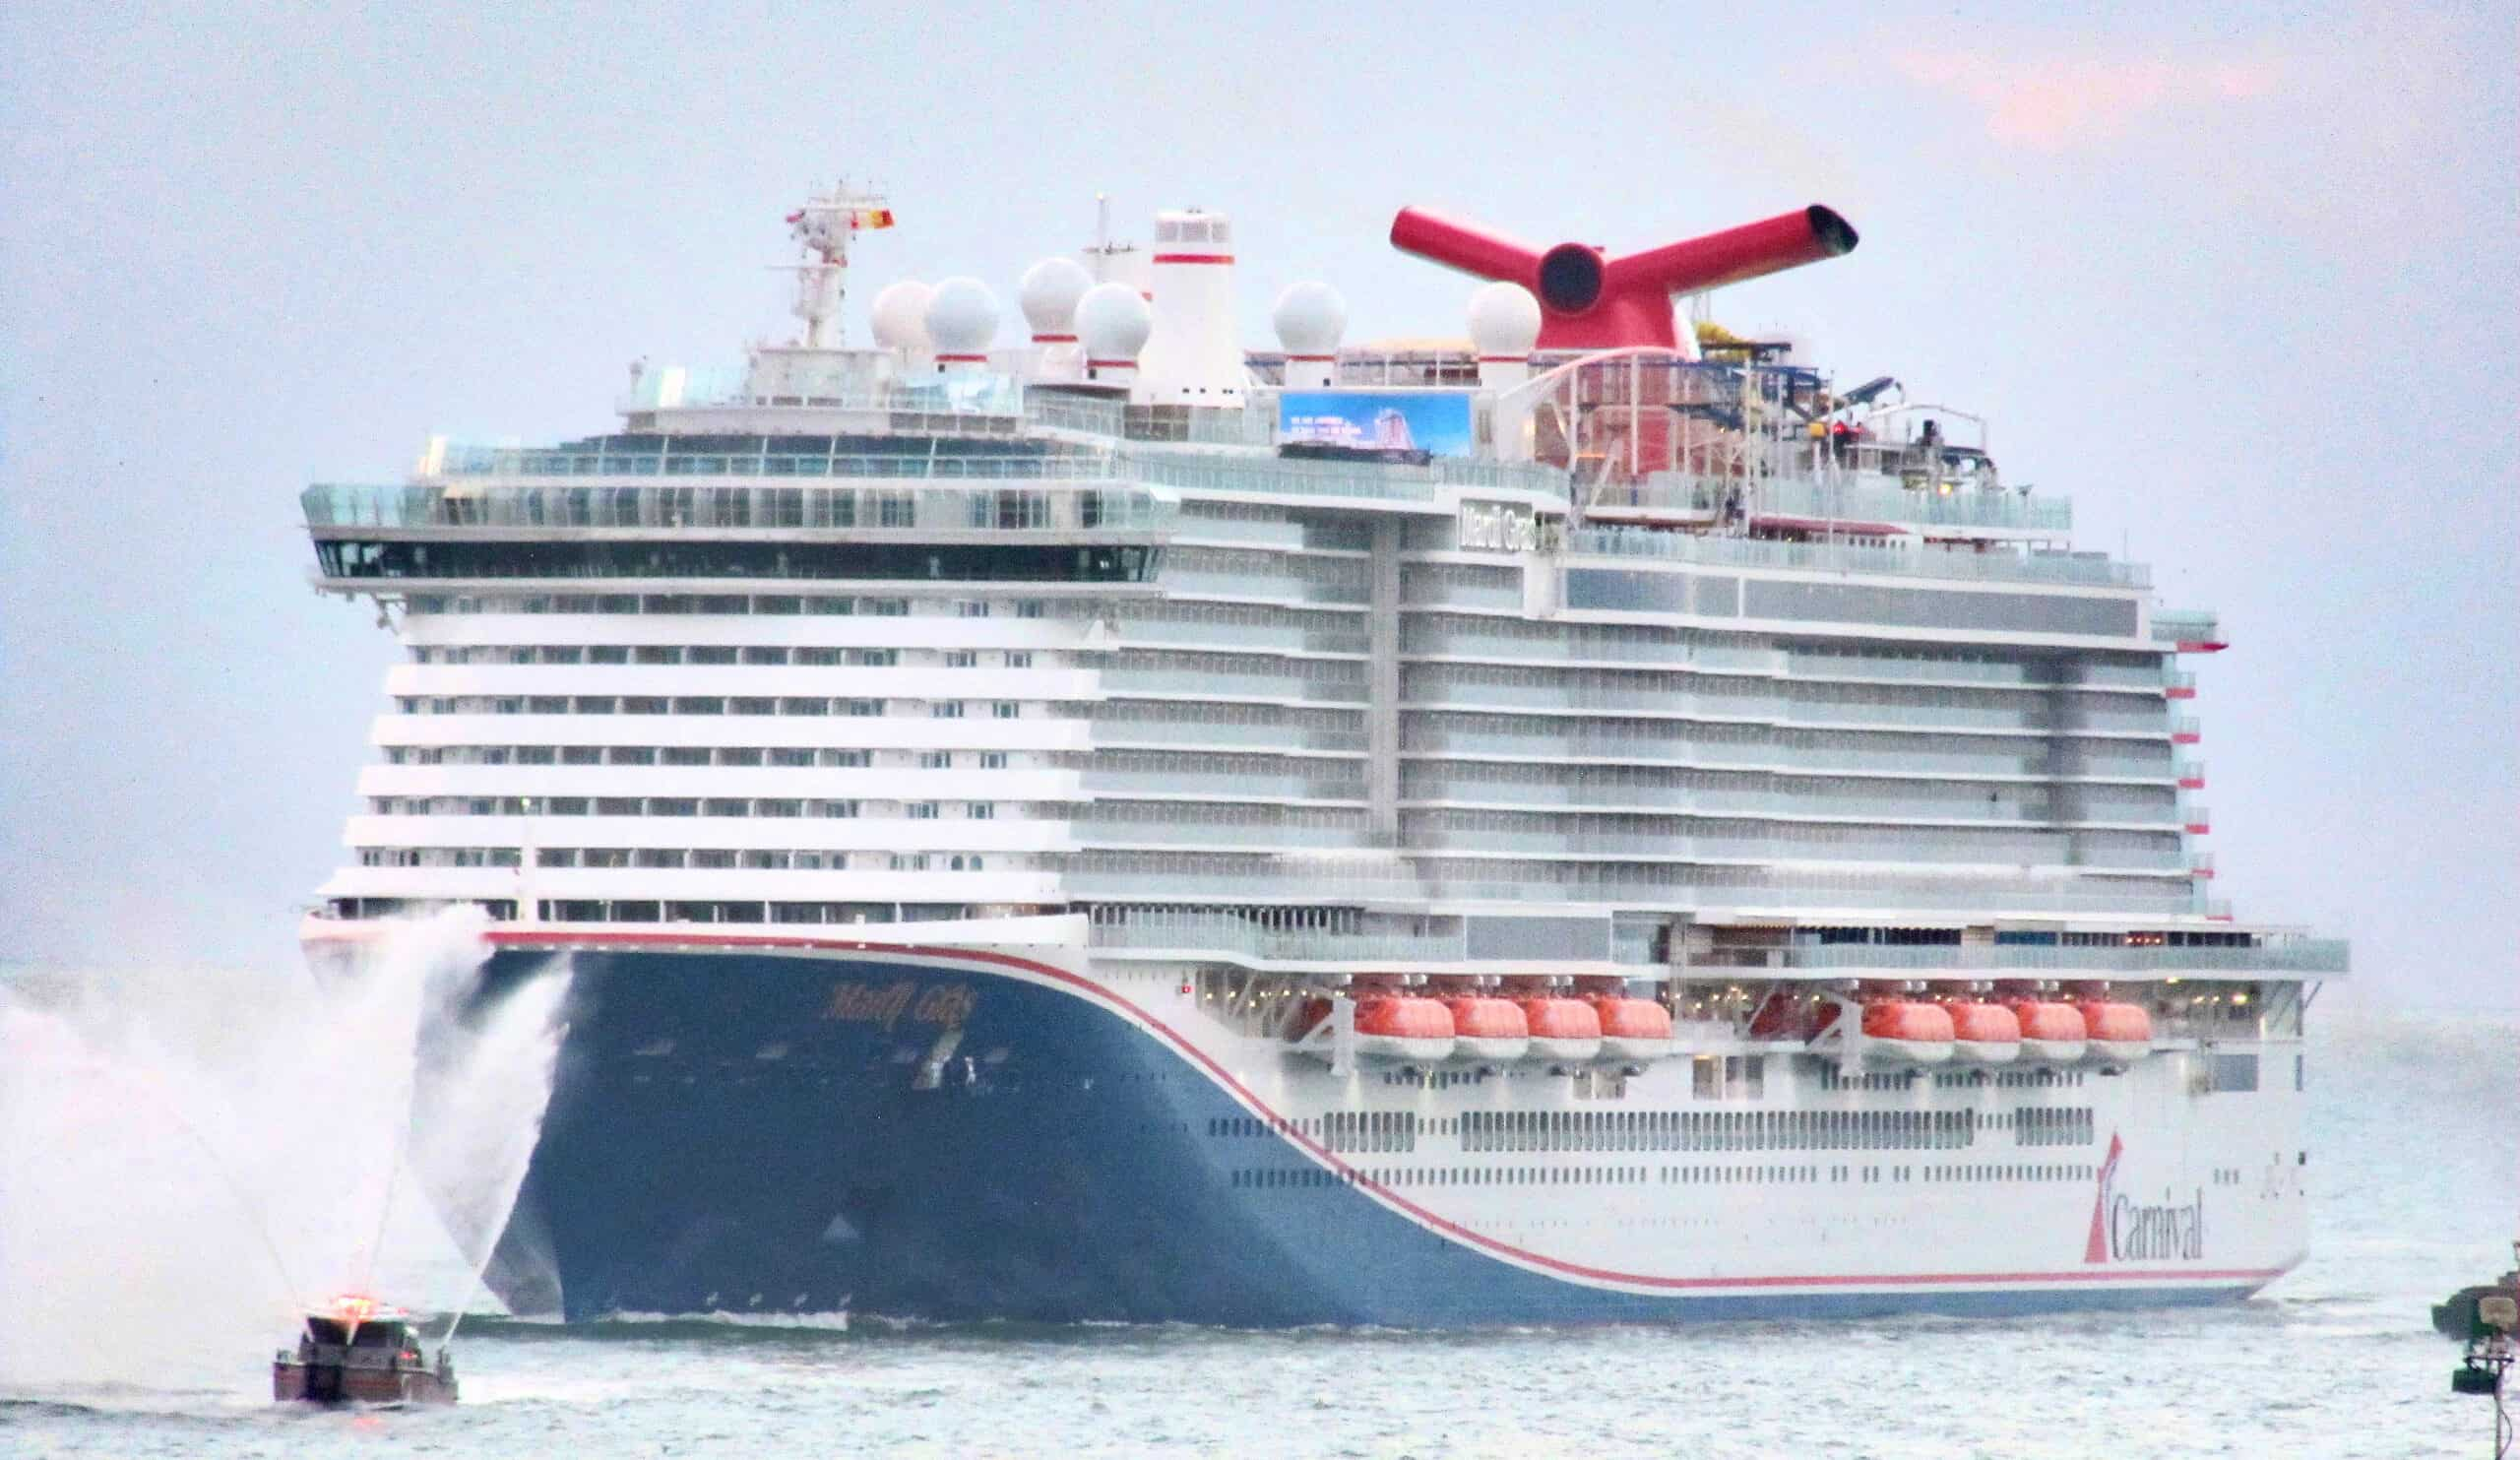 Mardi Gras Cruise Ship